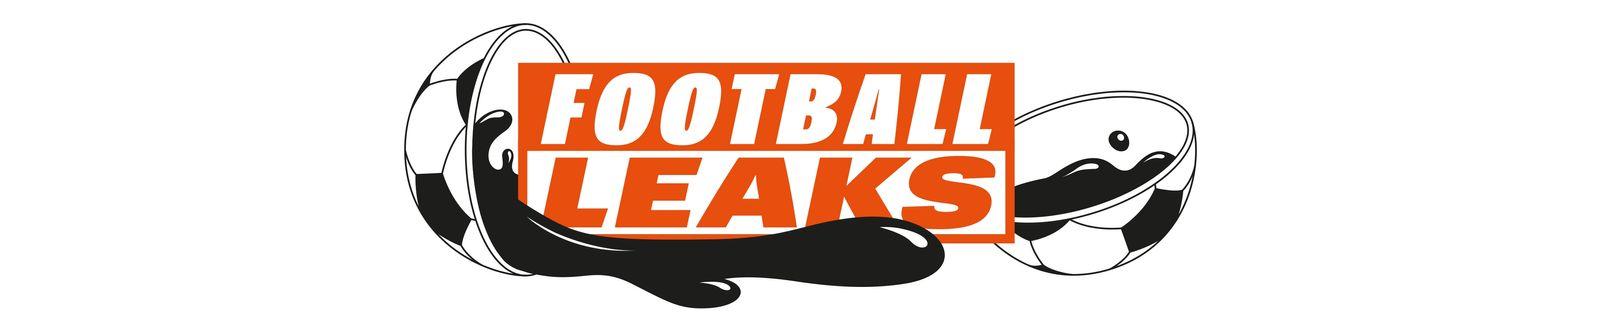 Football Leaks 30.10.2018 Von Elsa freigegeben